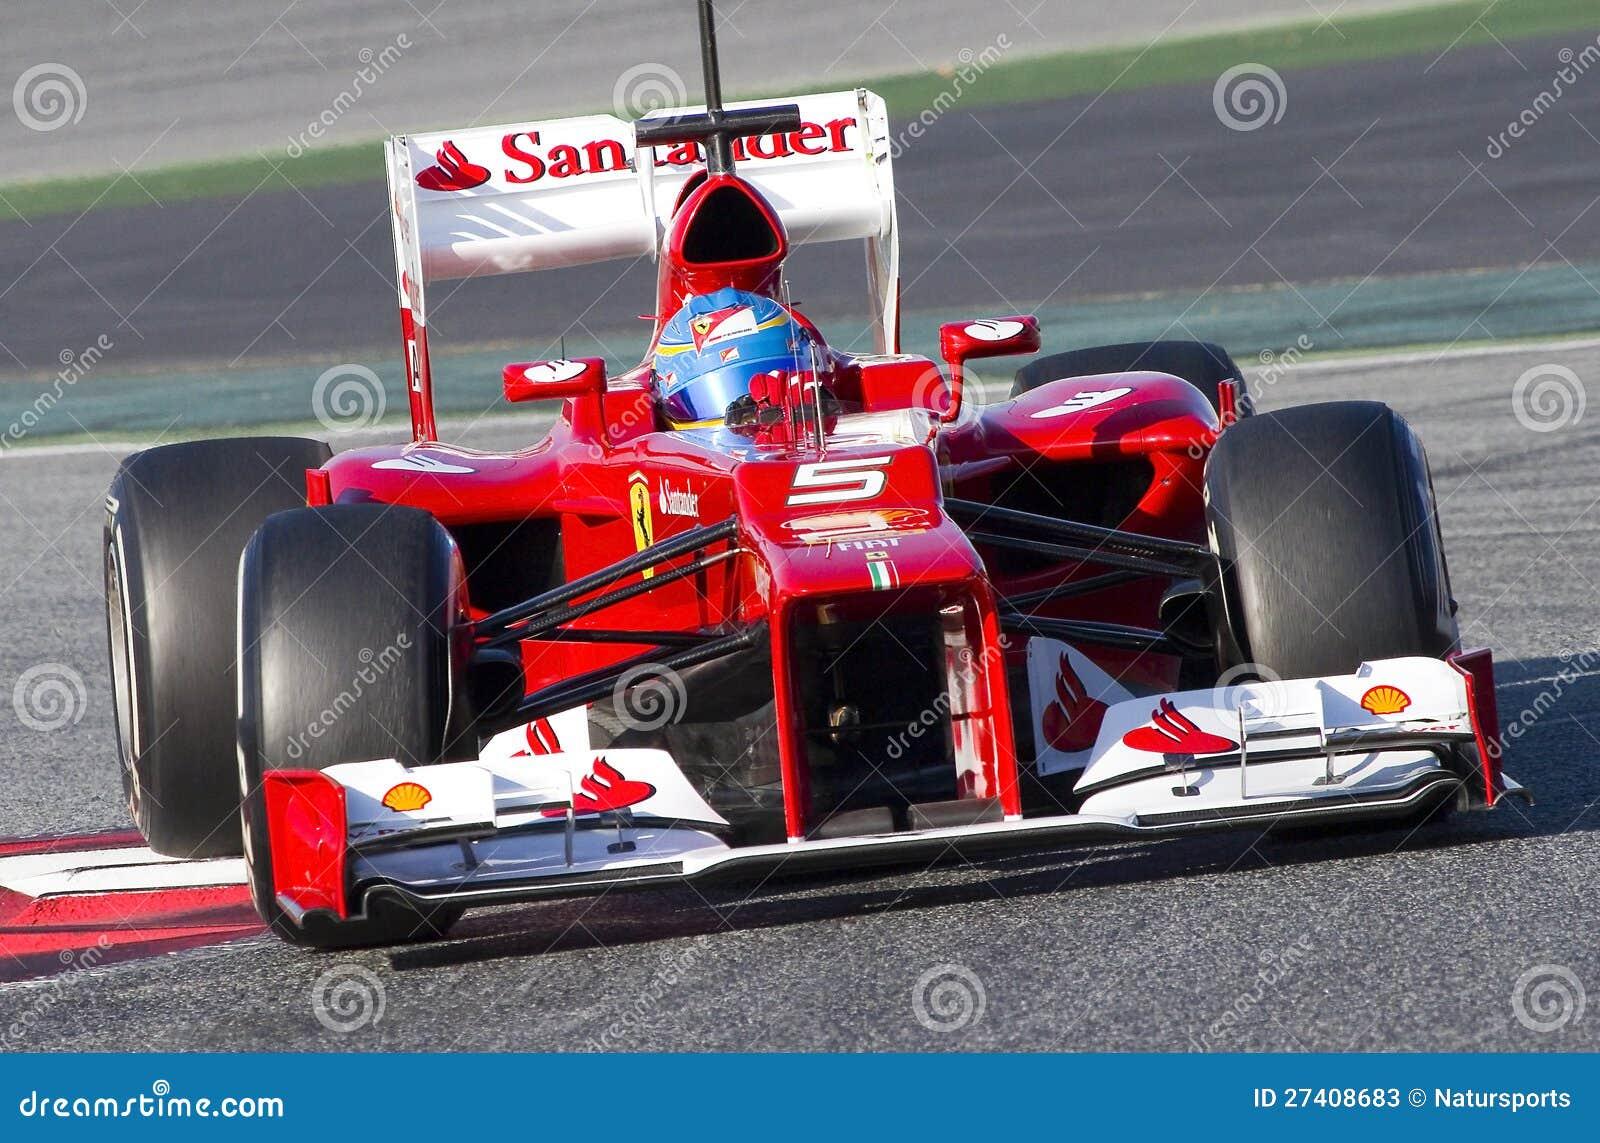 Formel 1 - Fernando Alonso